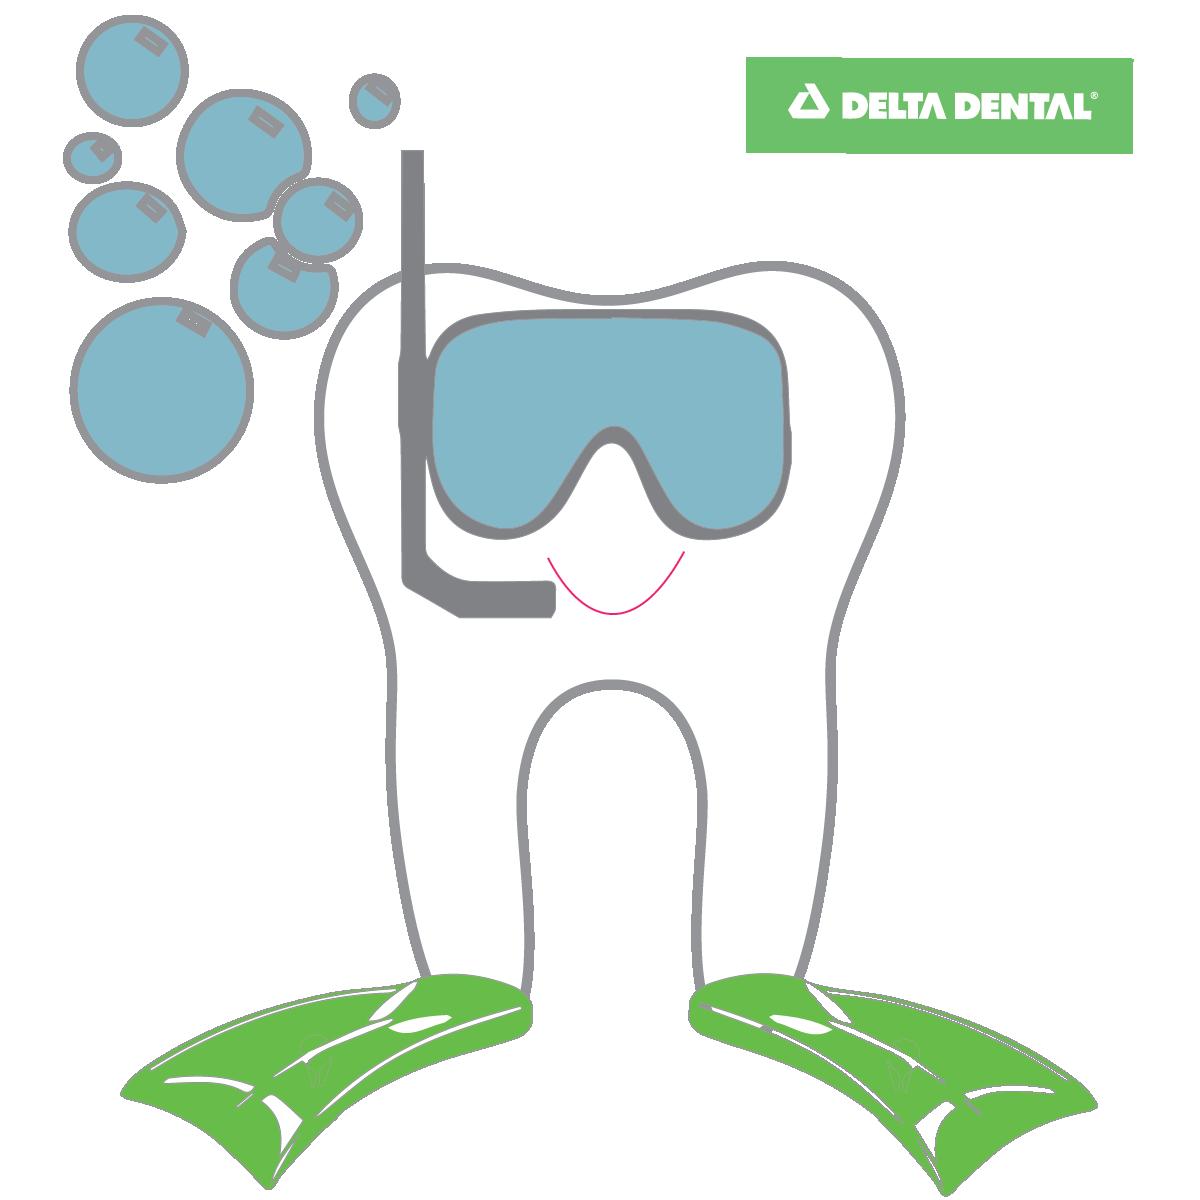 Smile safety tips for. Glove clipart dental